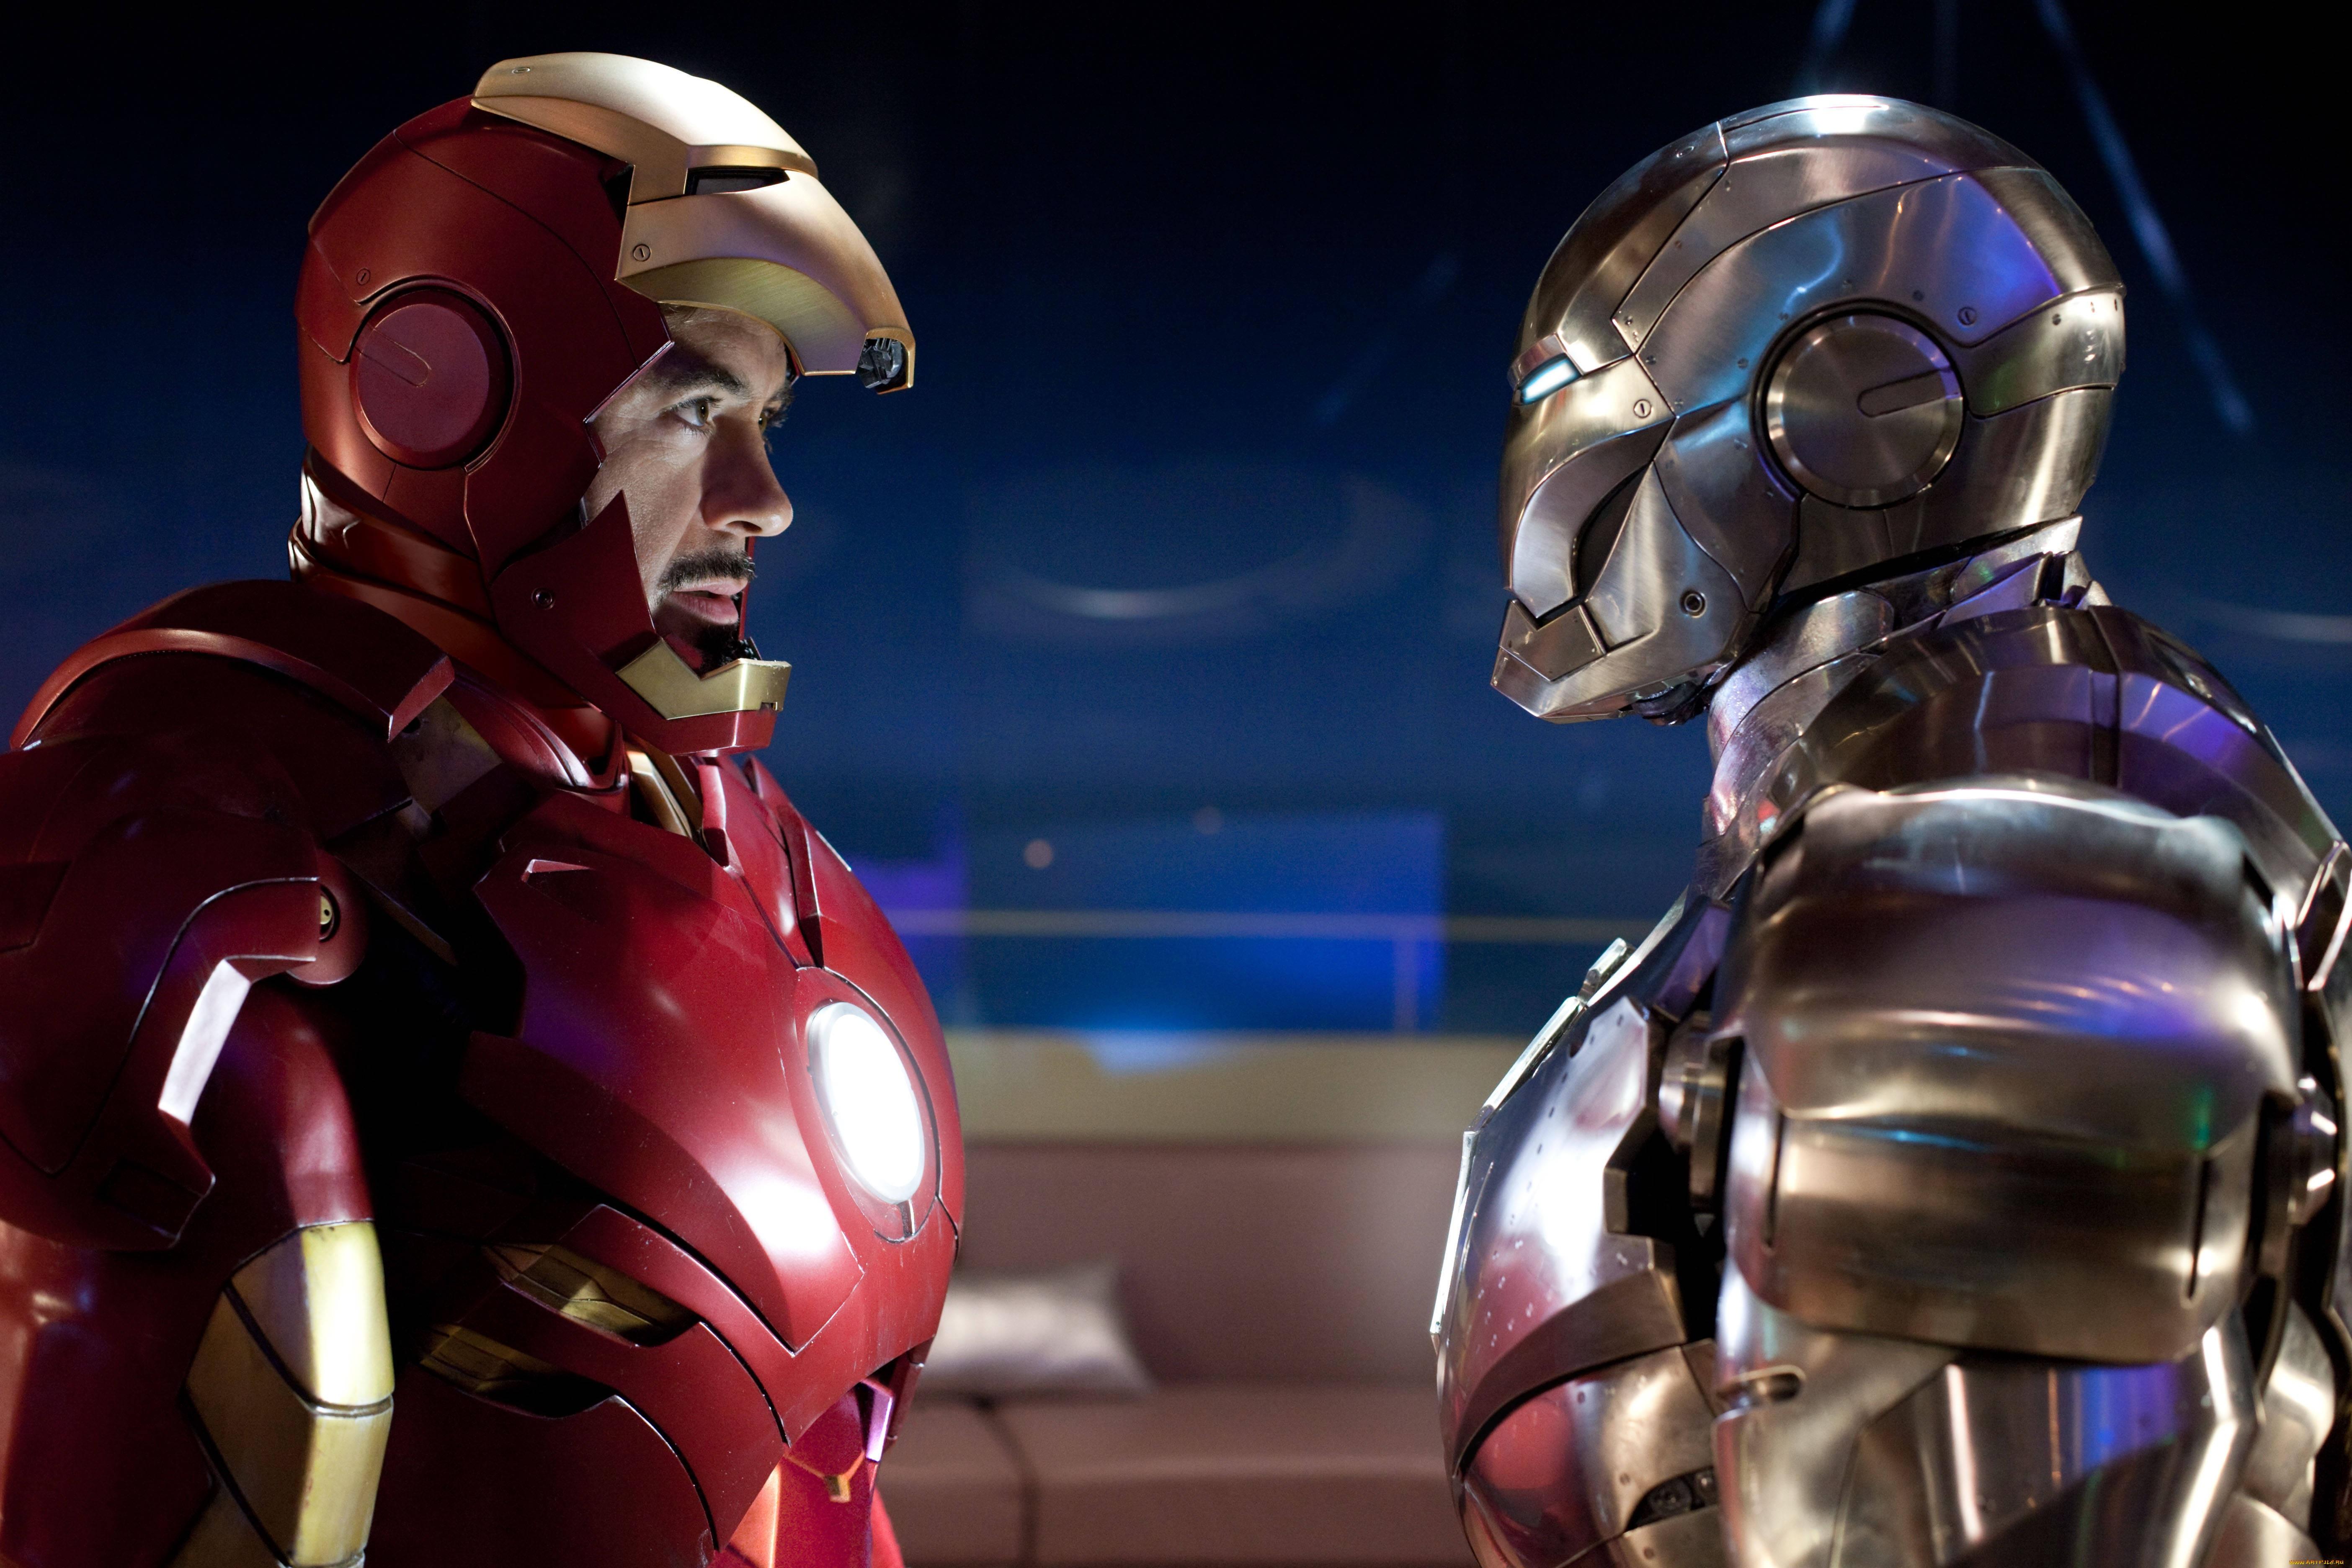 Tony and Rhodey fights in Malibu Mansion - Iron Man 2